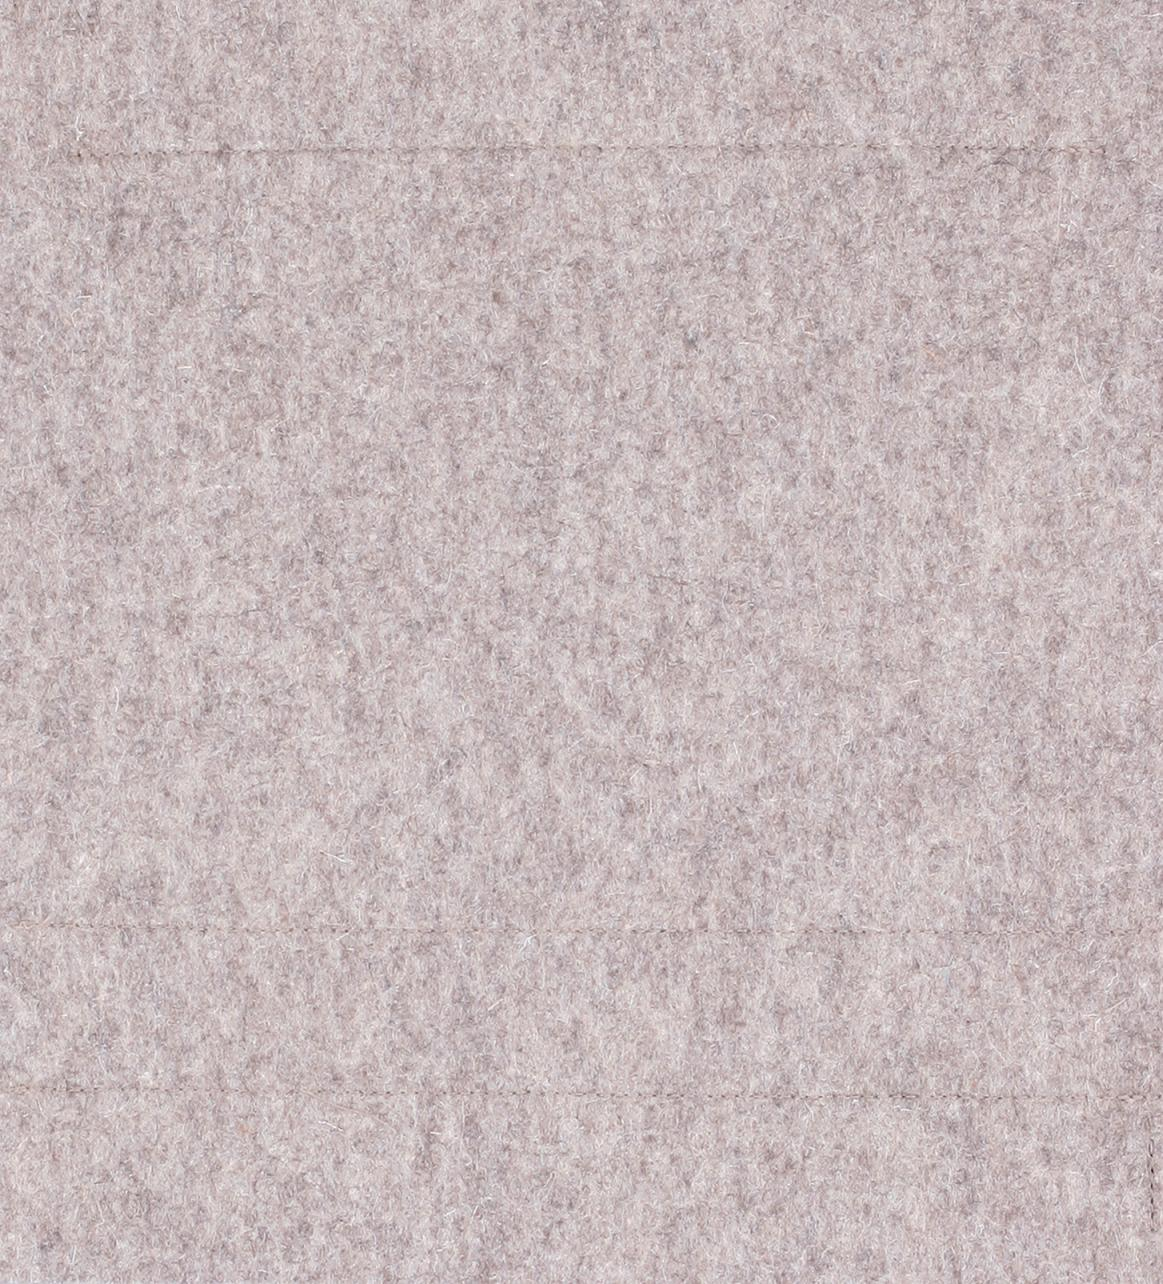 Filz graubraun (mittel)